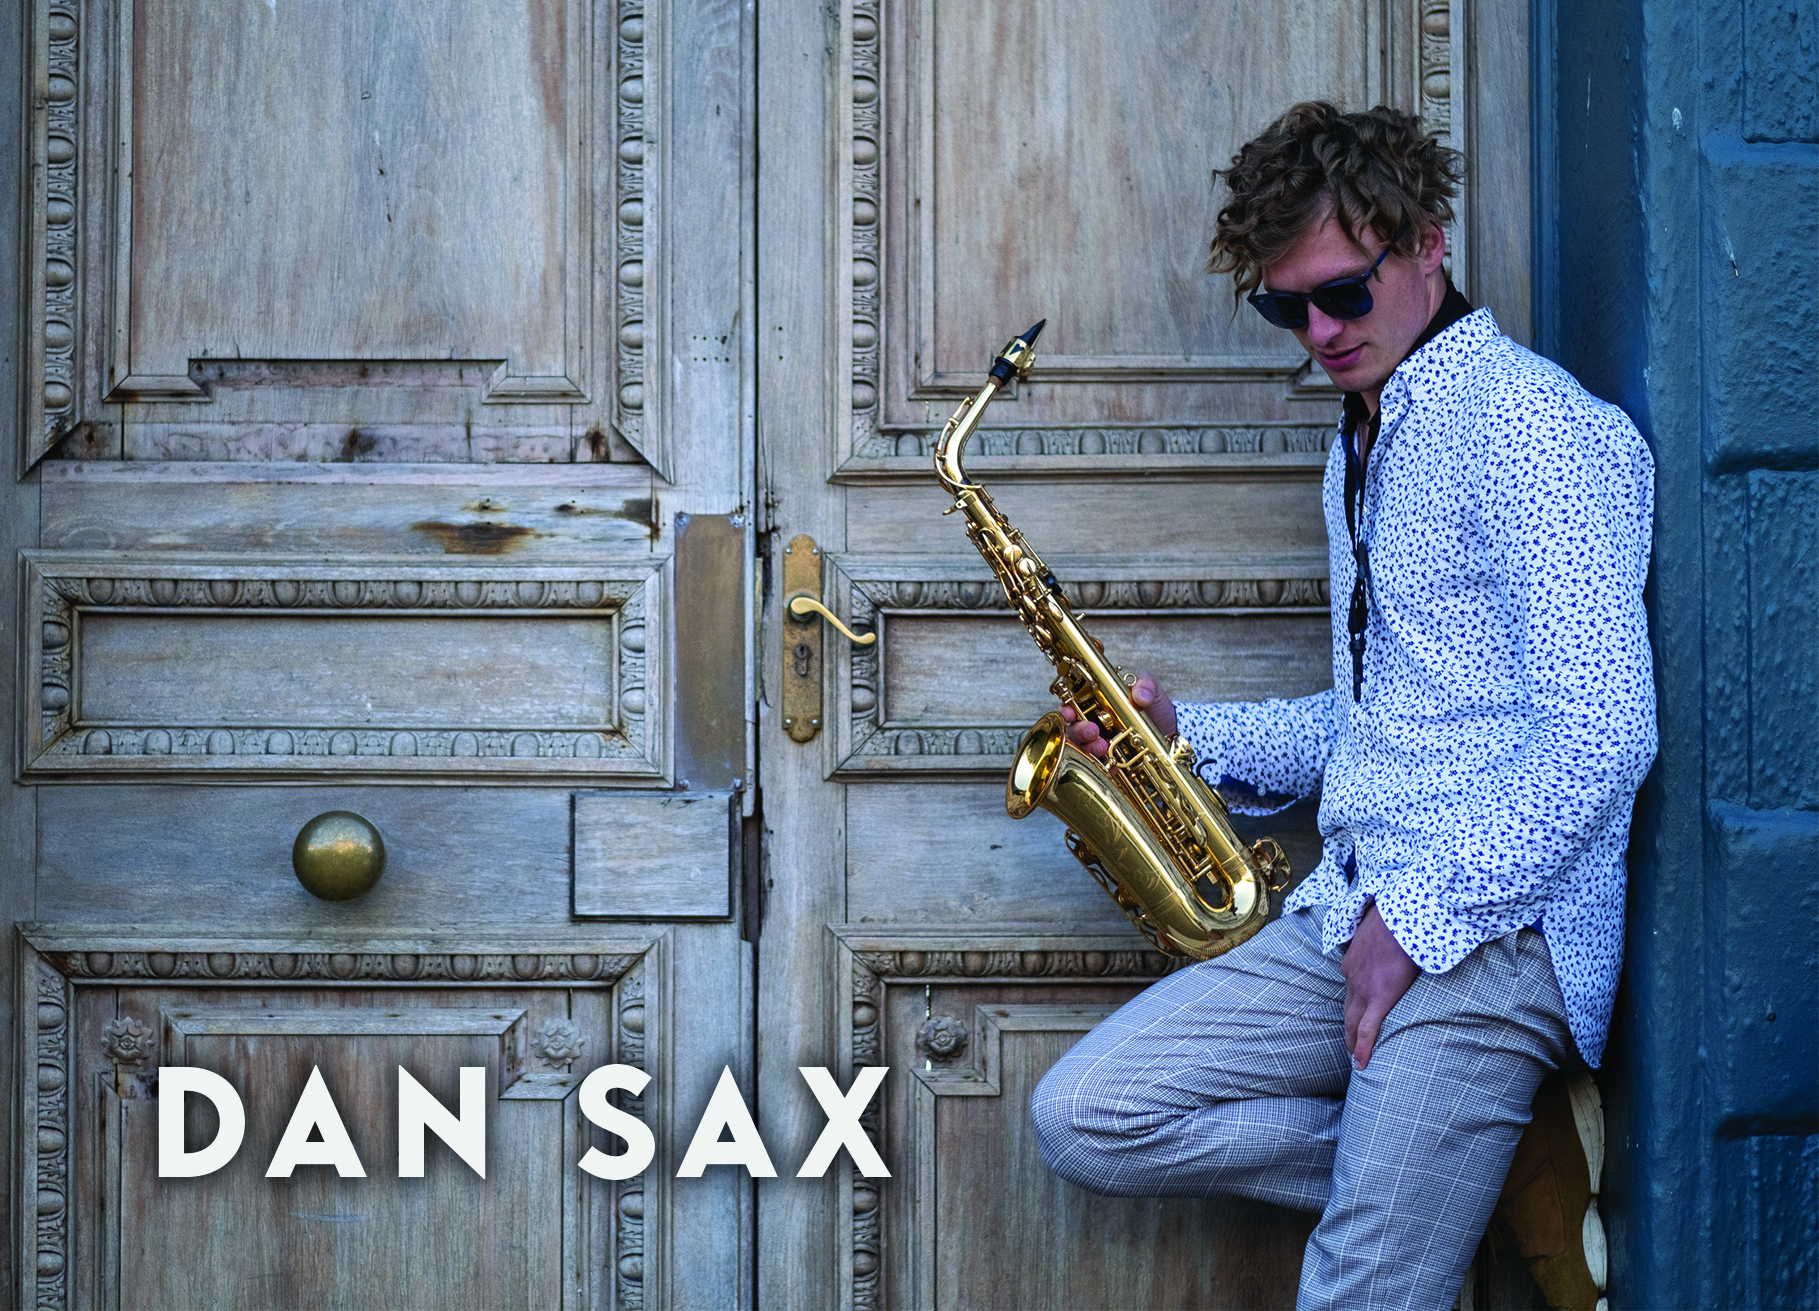 dan sax flyer.jpg